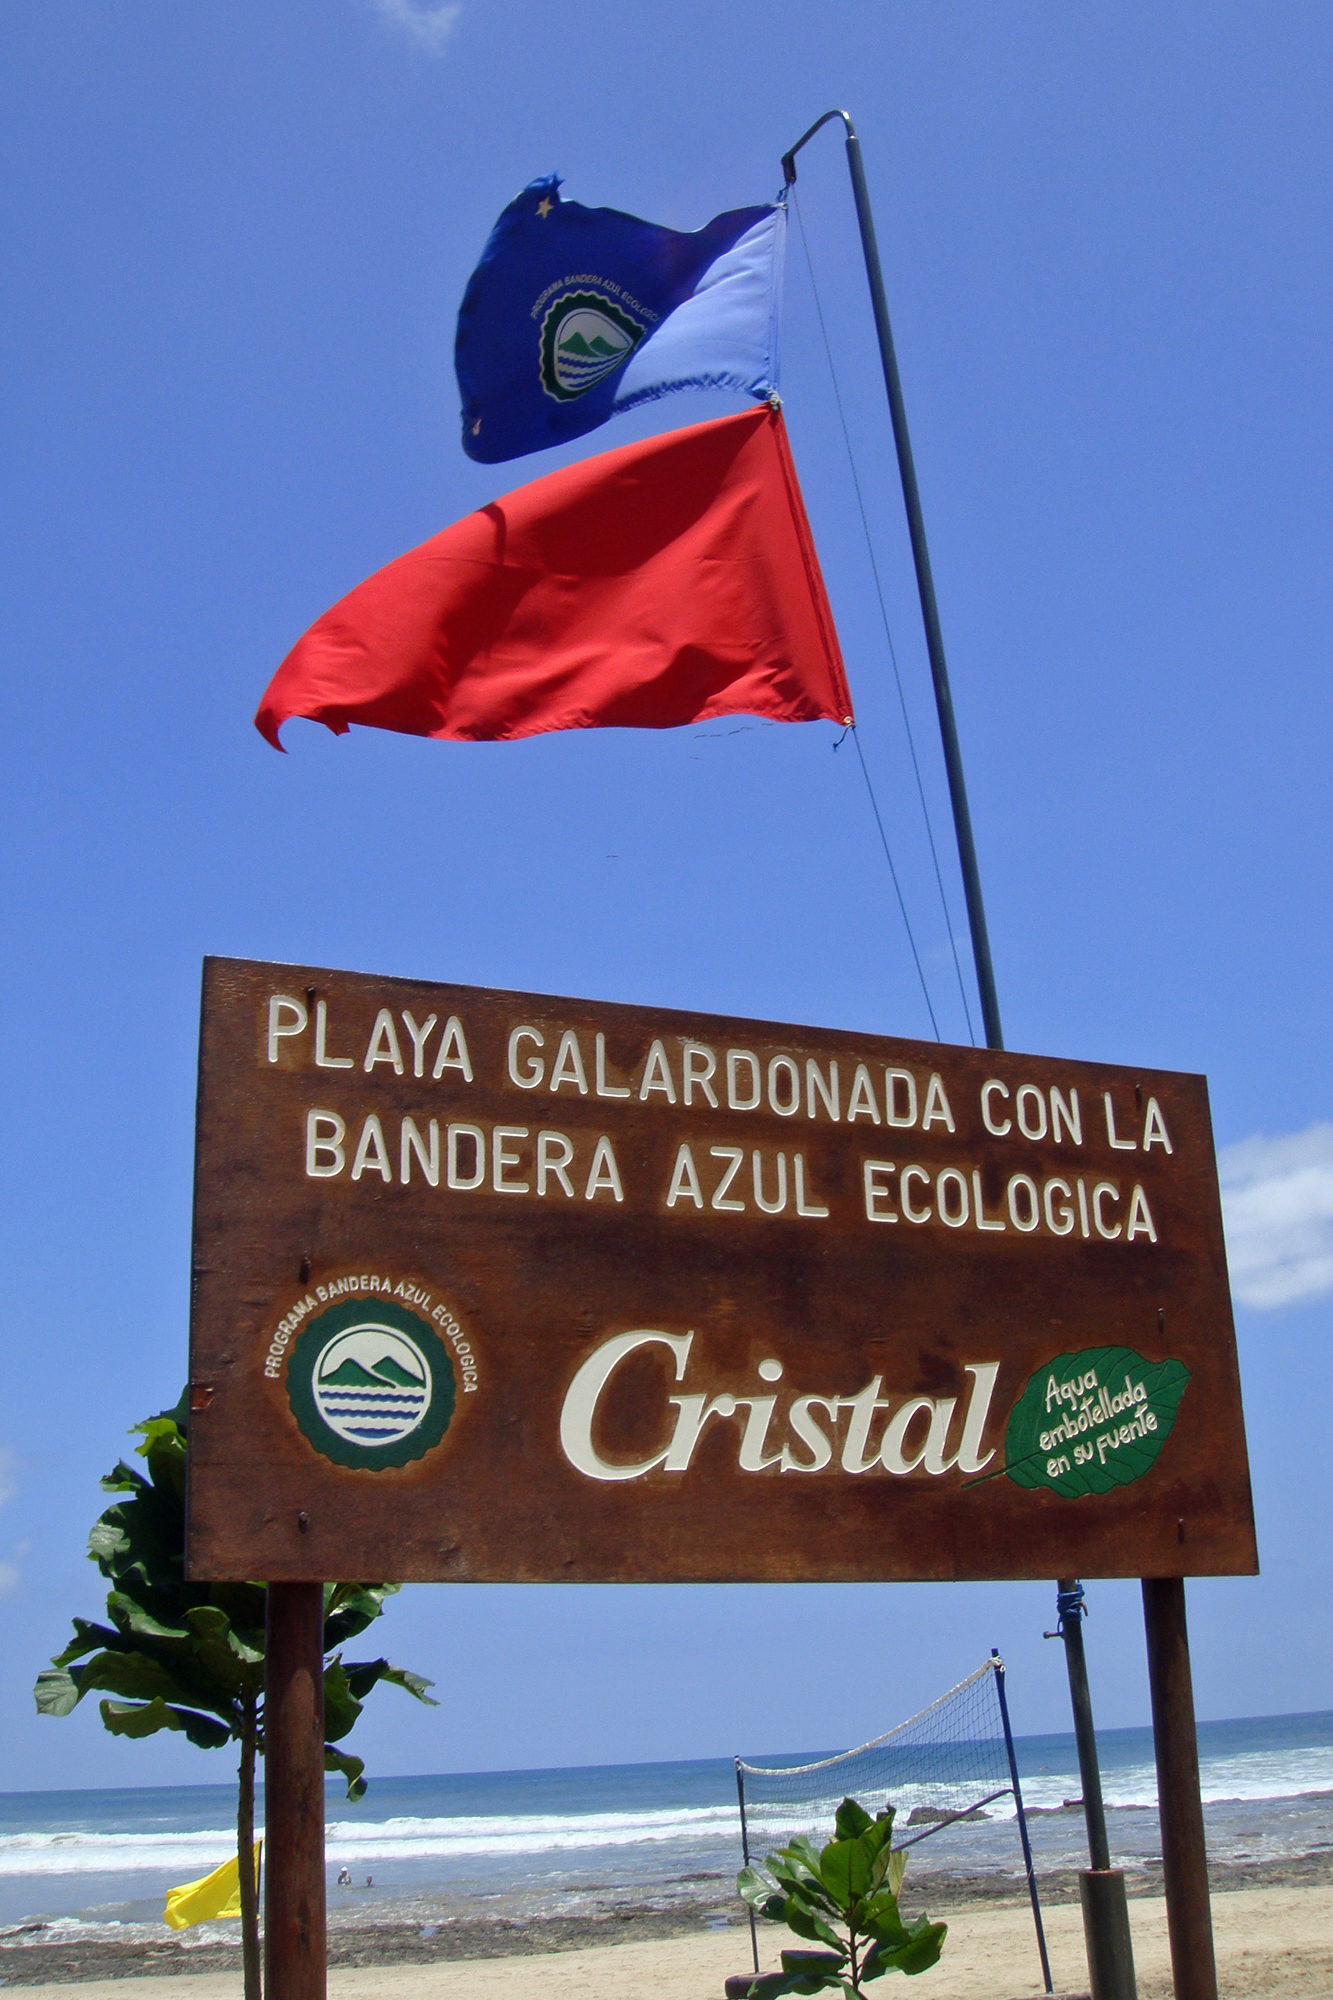 Bandera Azul Ecologica (Ecological Blue Flag)